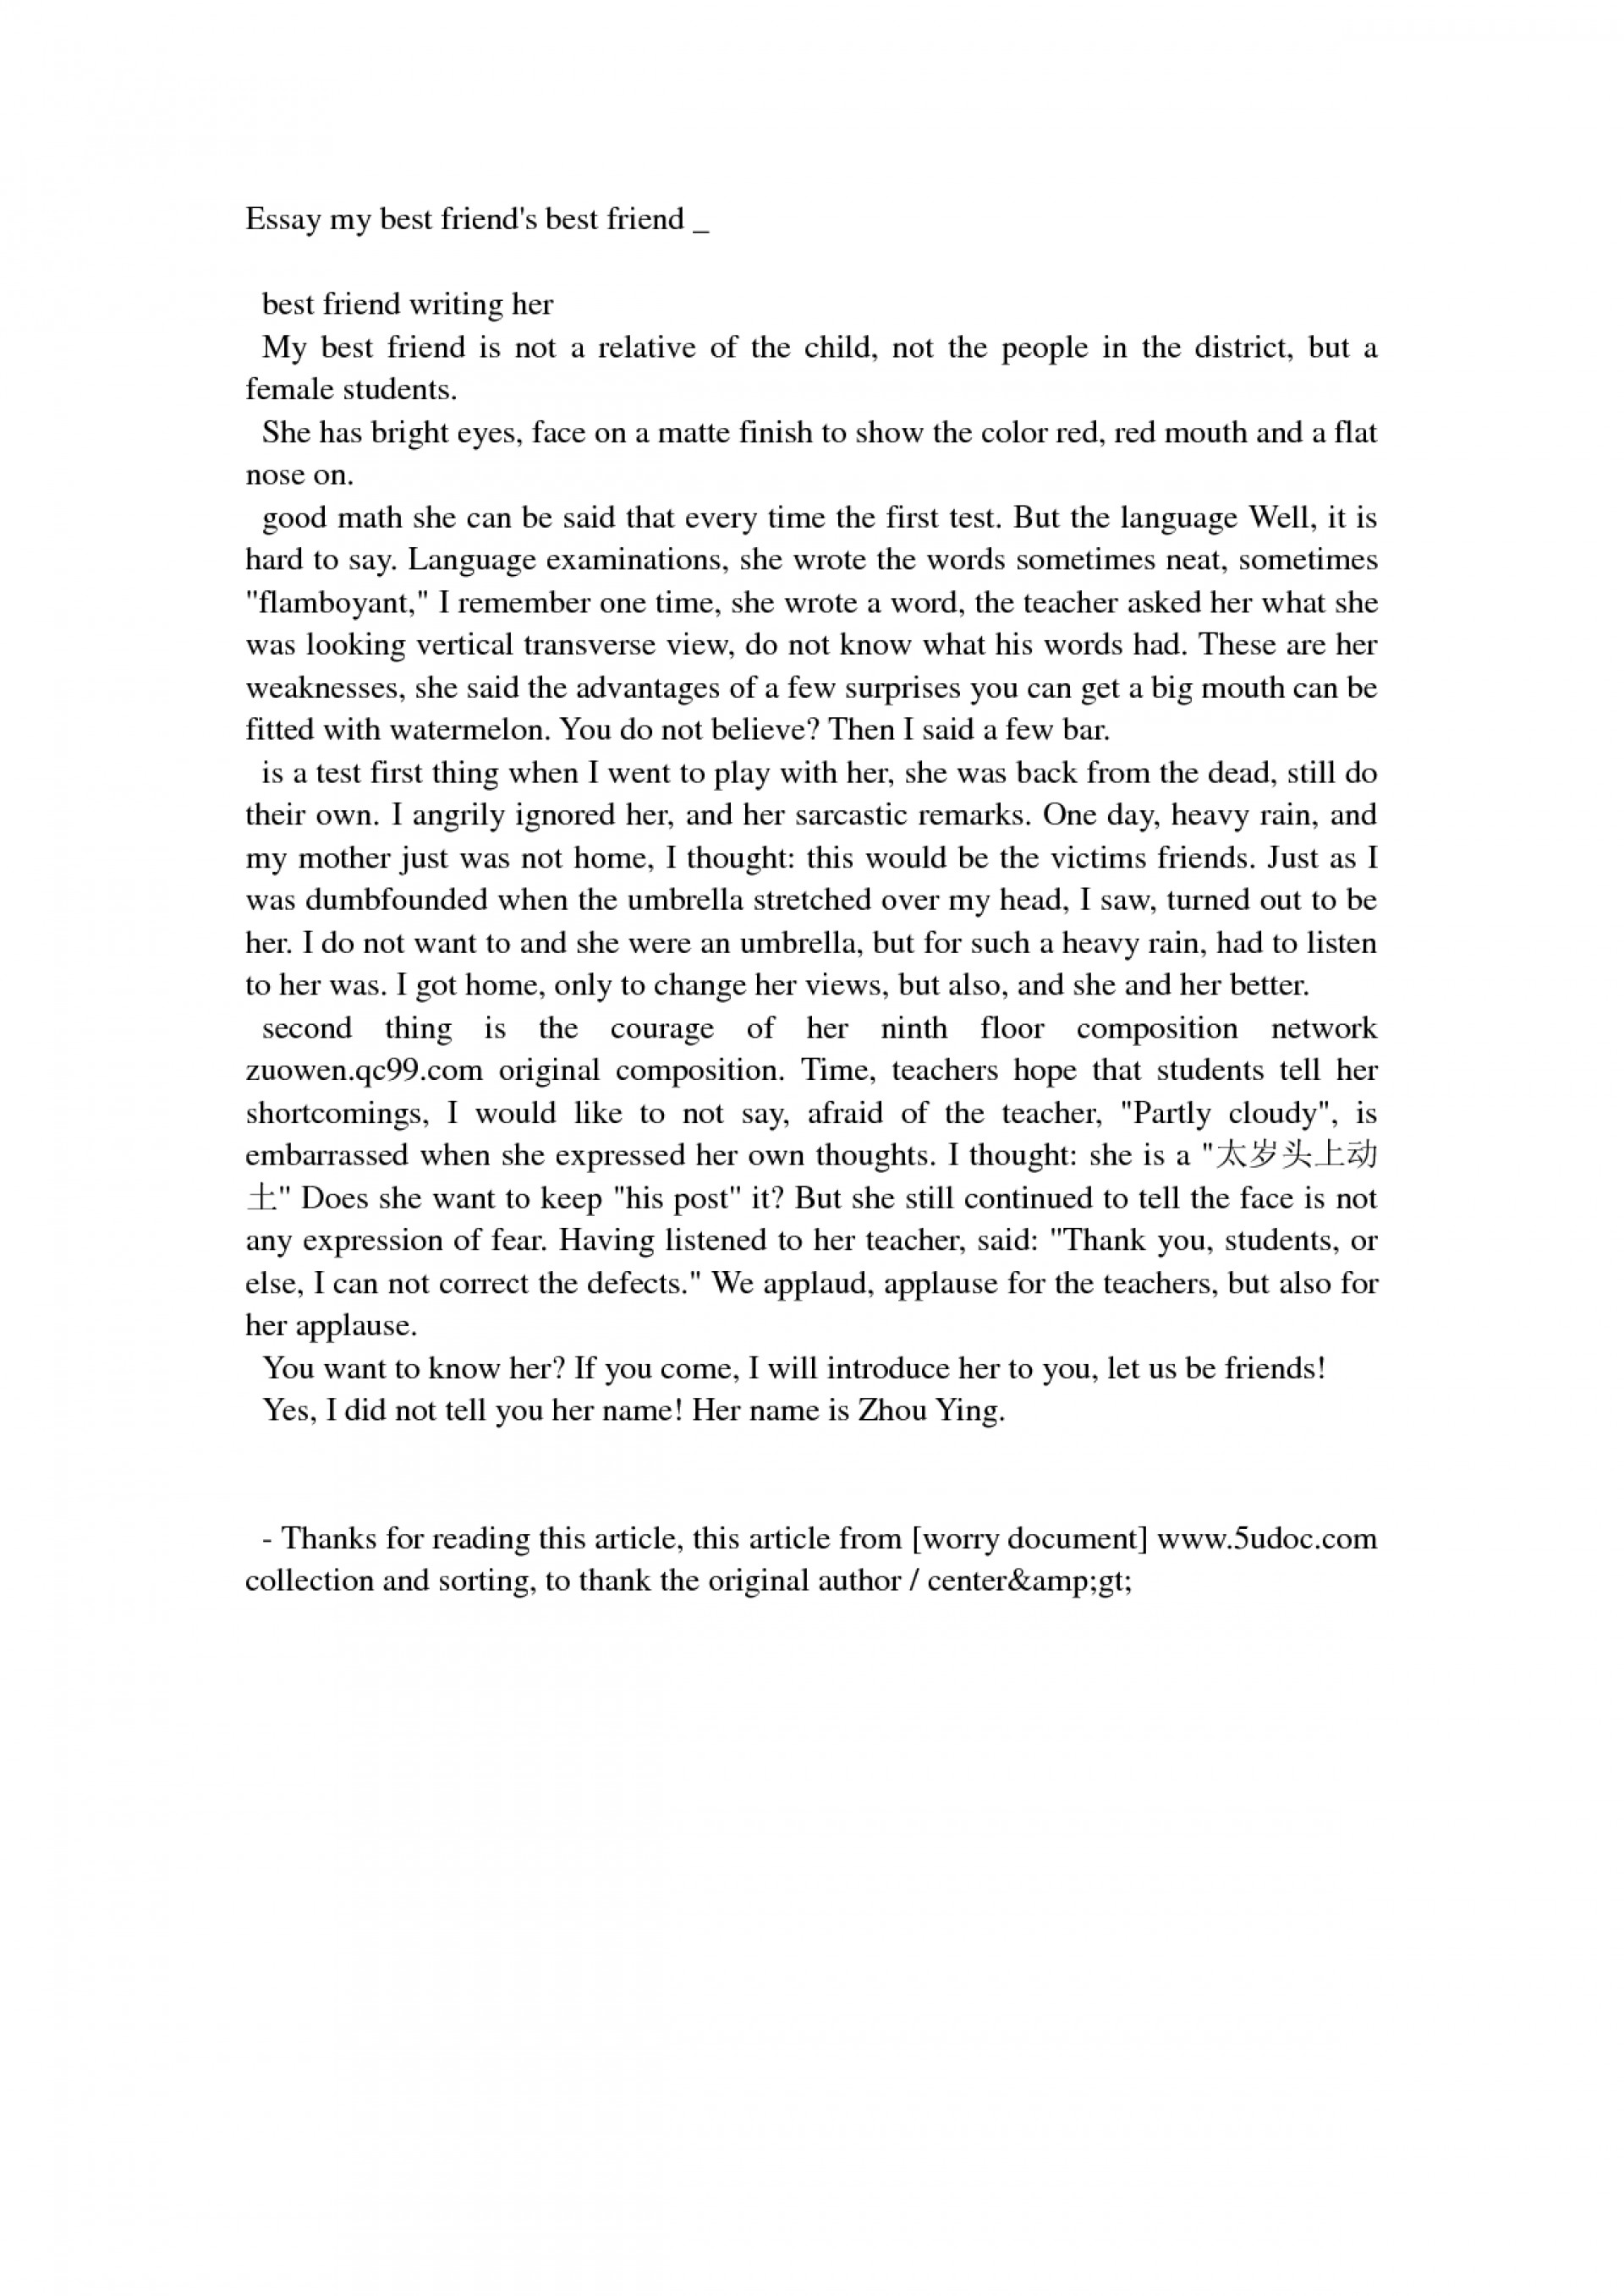 004 Essay Example Friendship Stunning Emerson Pdf By Ralph Waldo Analysis Title Ideas 1920